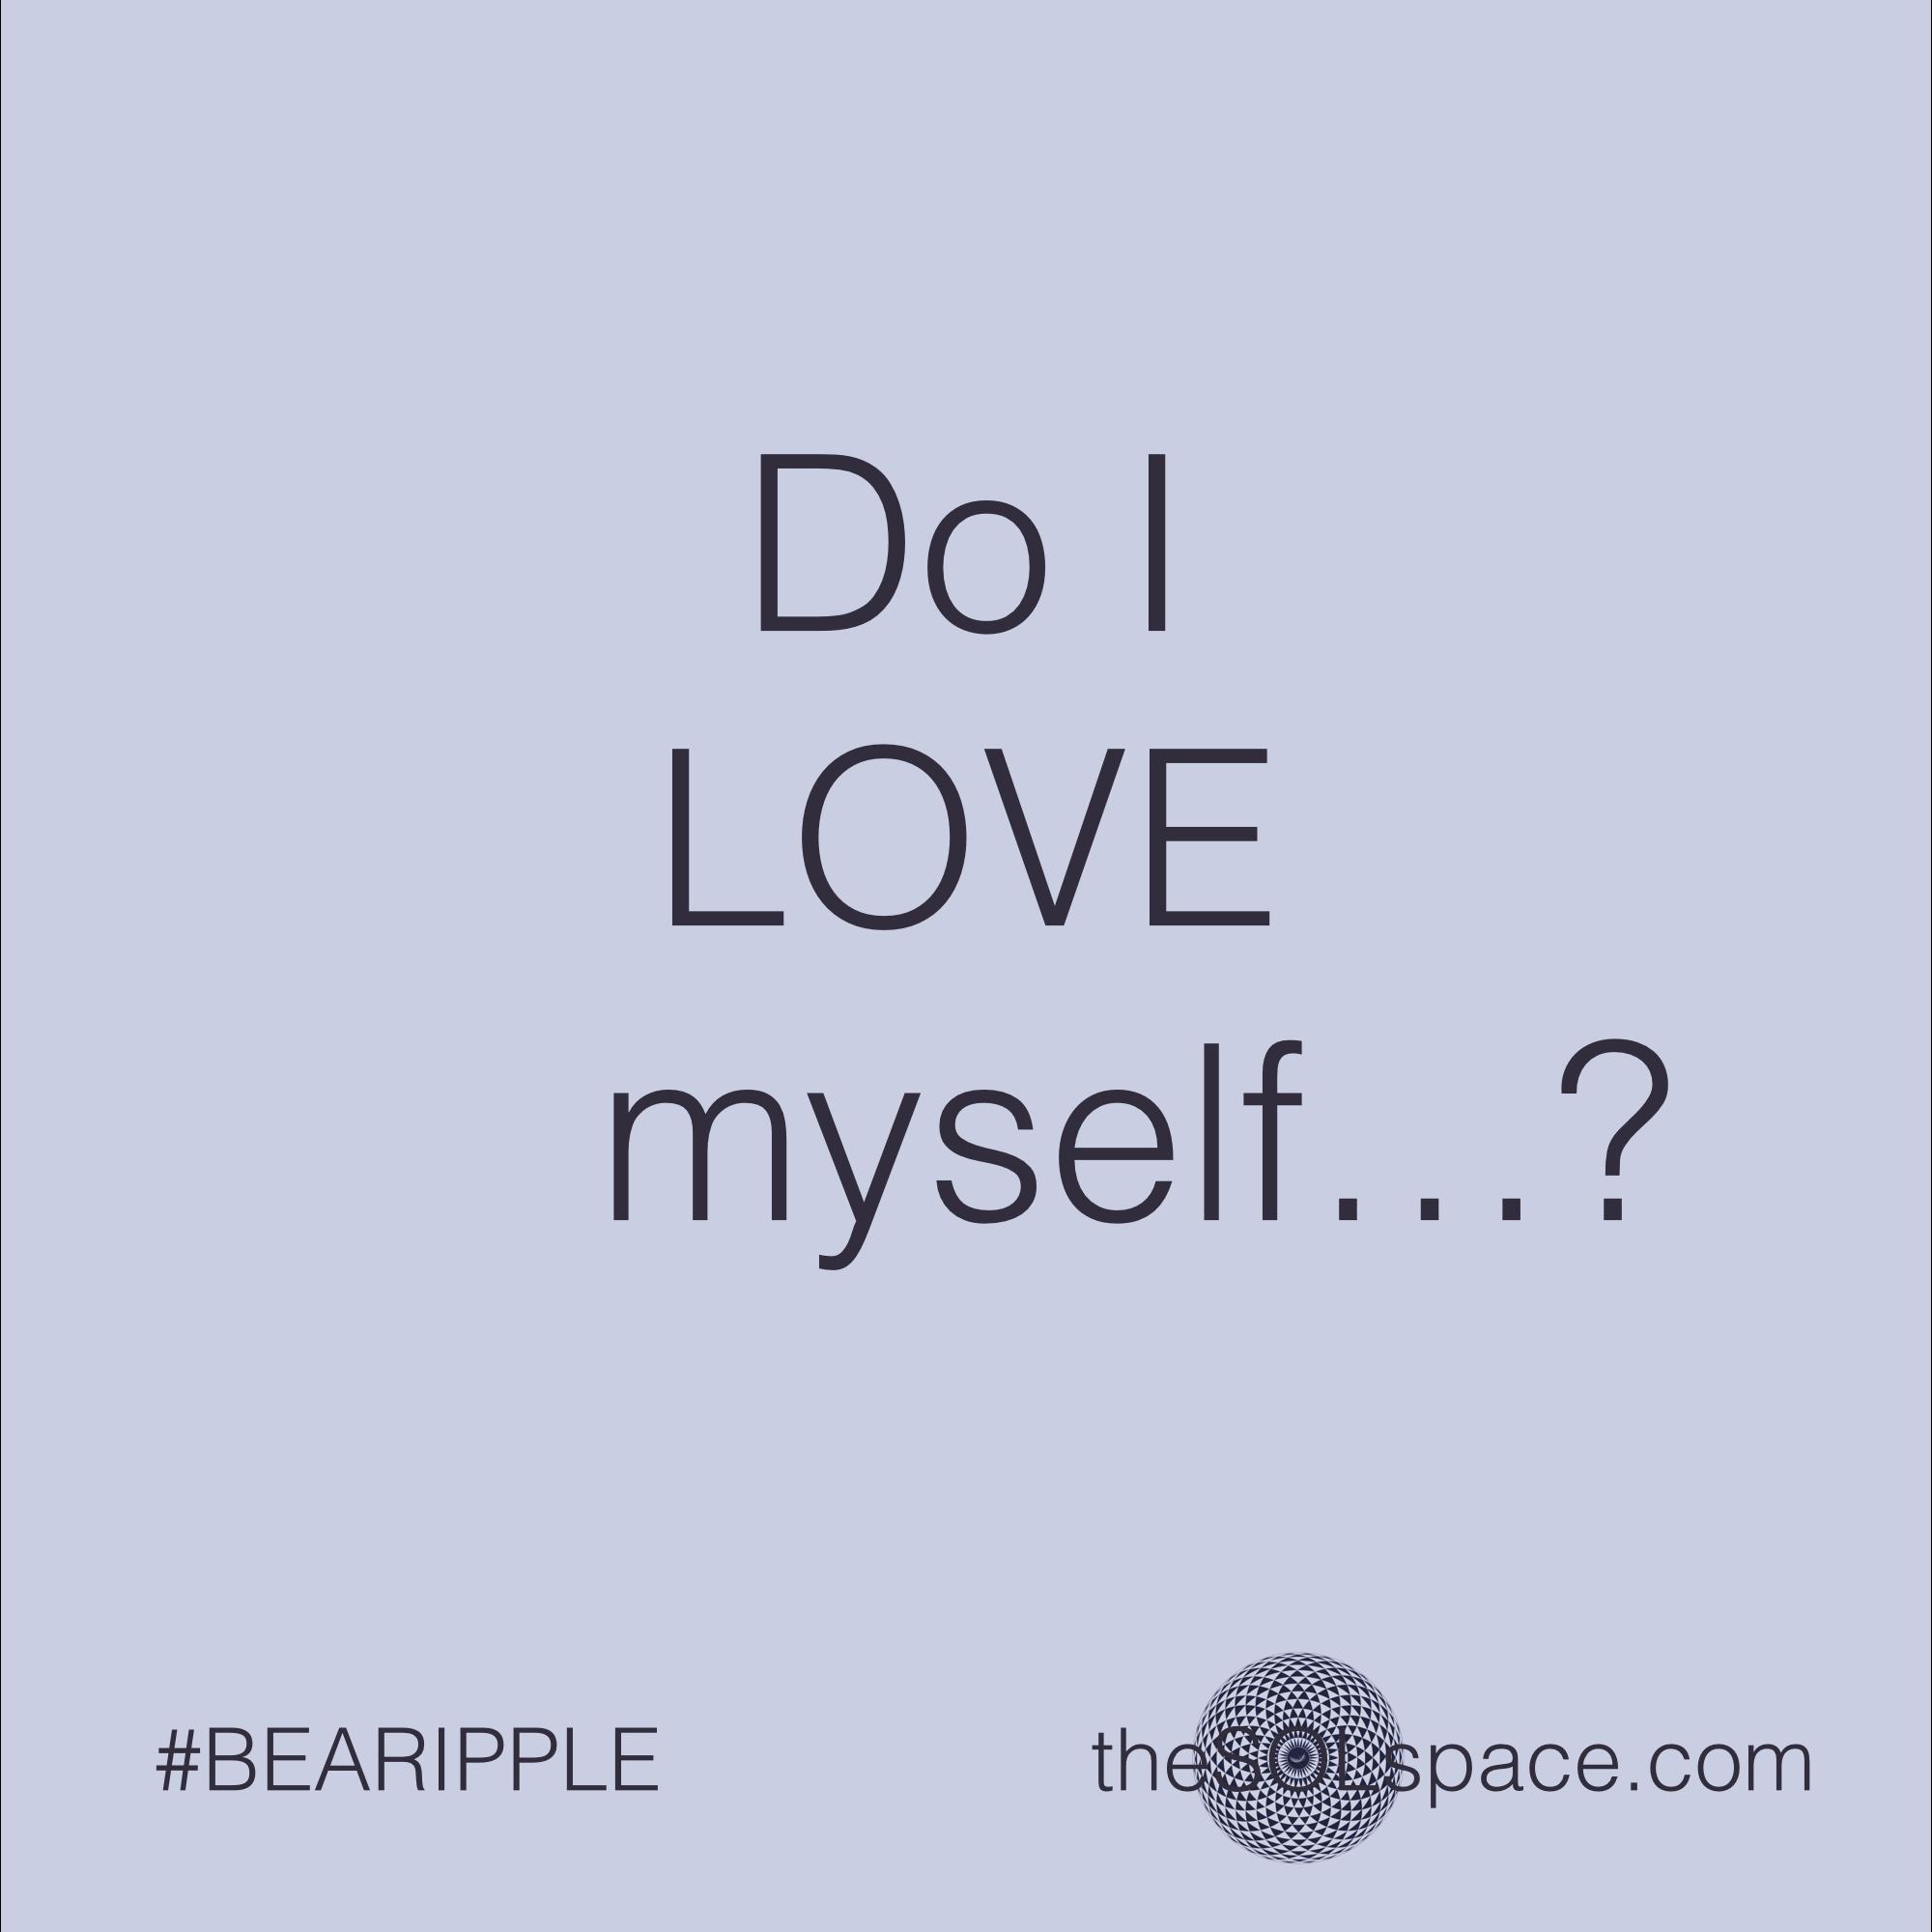 #BeARipple..Do I LOVE myself...? @theSOLspace